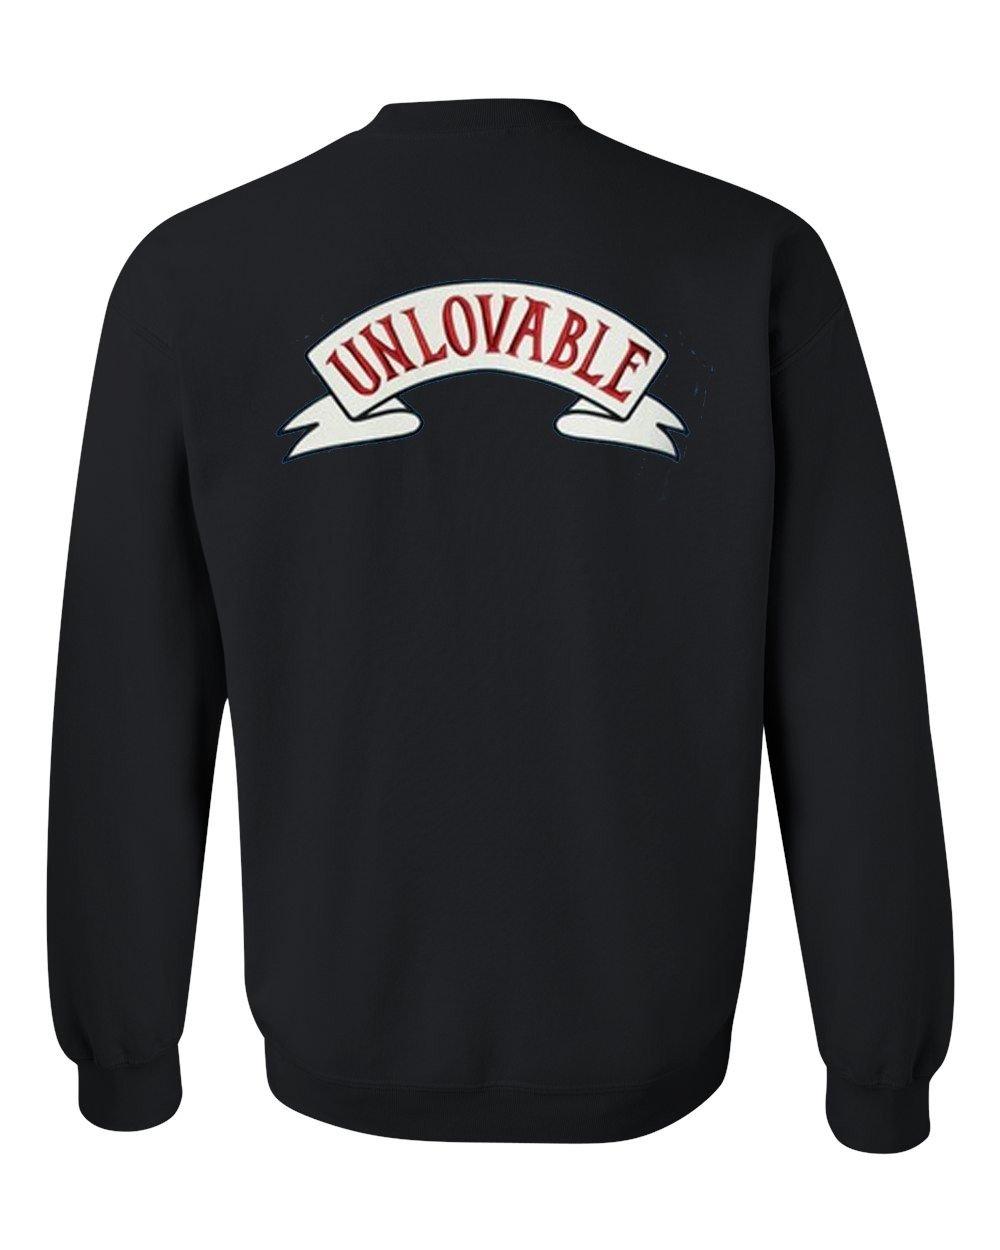 unlovable sweatshirt back